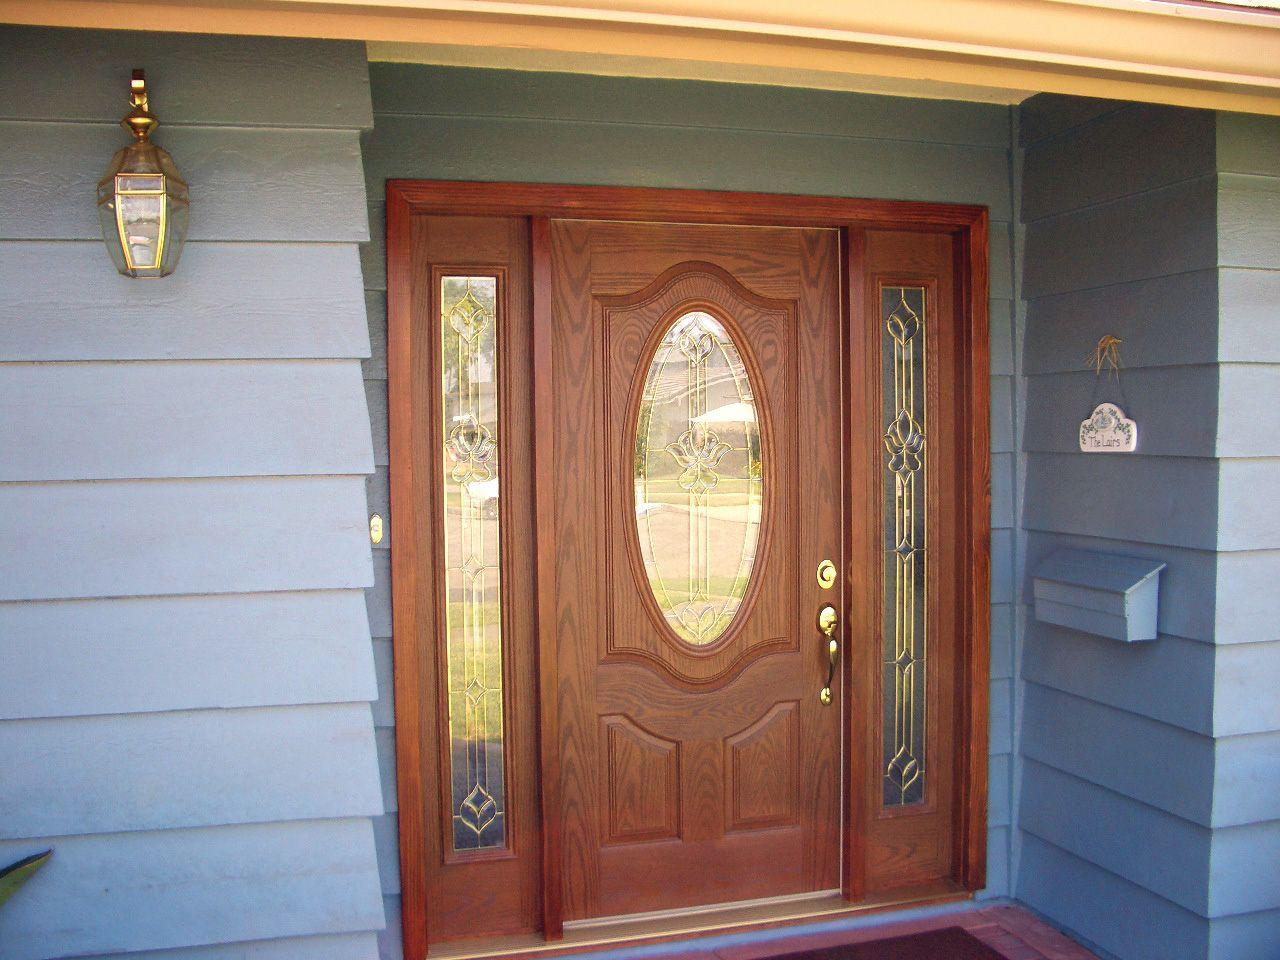 Merveilleux Single Front Door Designs: Beautiful Front Porch Design Ideas With Light  Grey Beam And Soft Blue Wooden Exterior Design